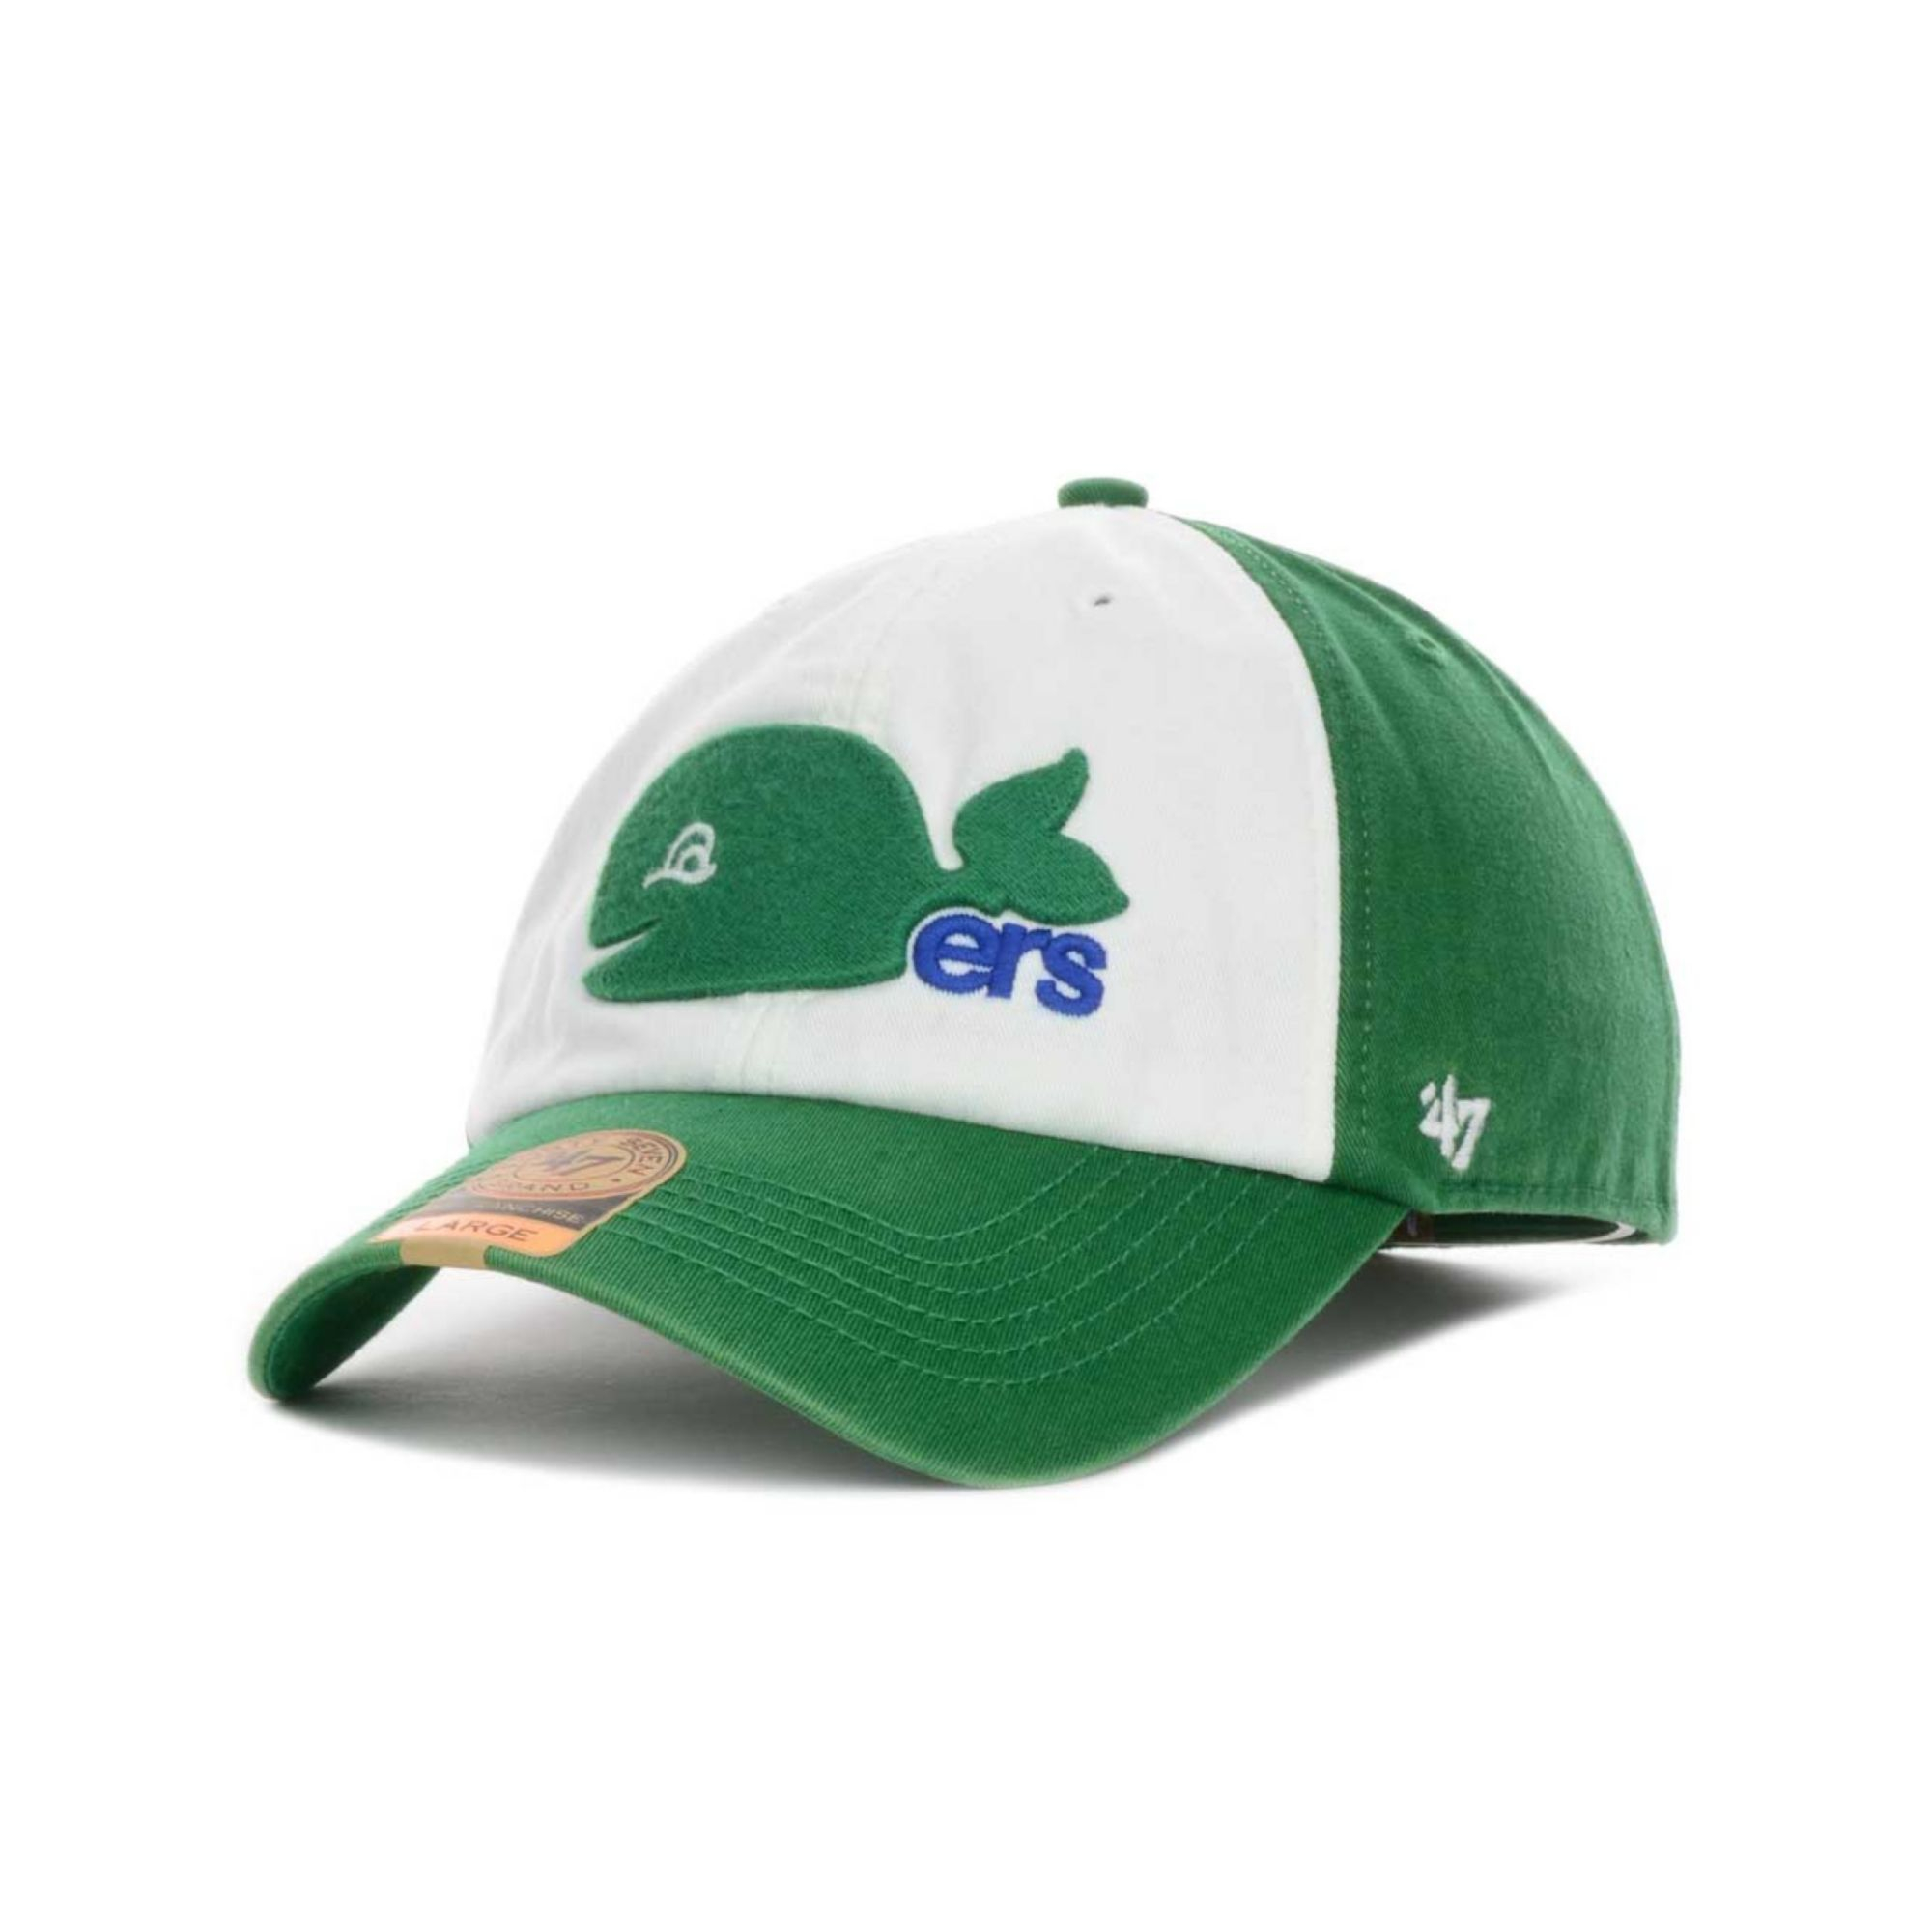 Lyst - 47 Brand Hartford Whalers Hof Fanchise Cap in Green for Men 9a02724dd20